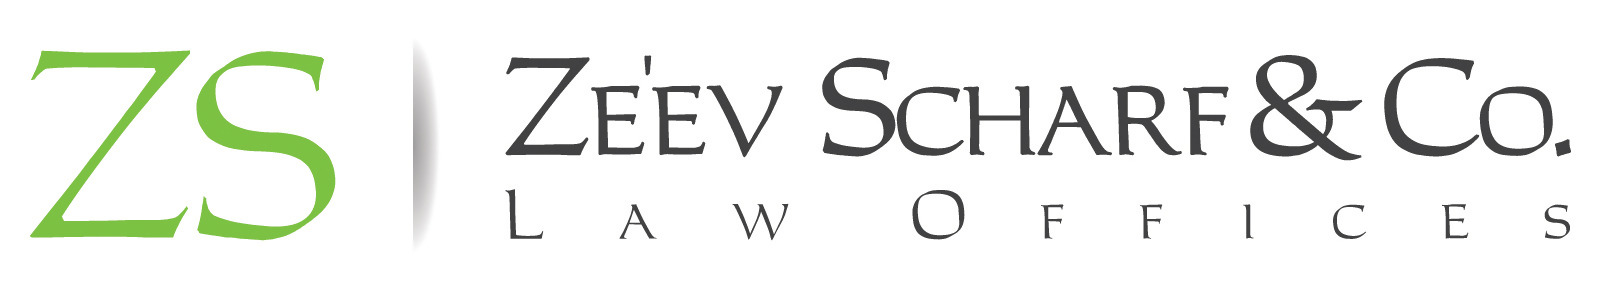 Zeev Scharf & co